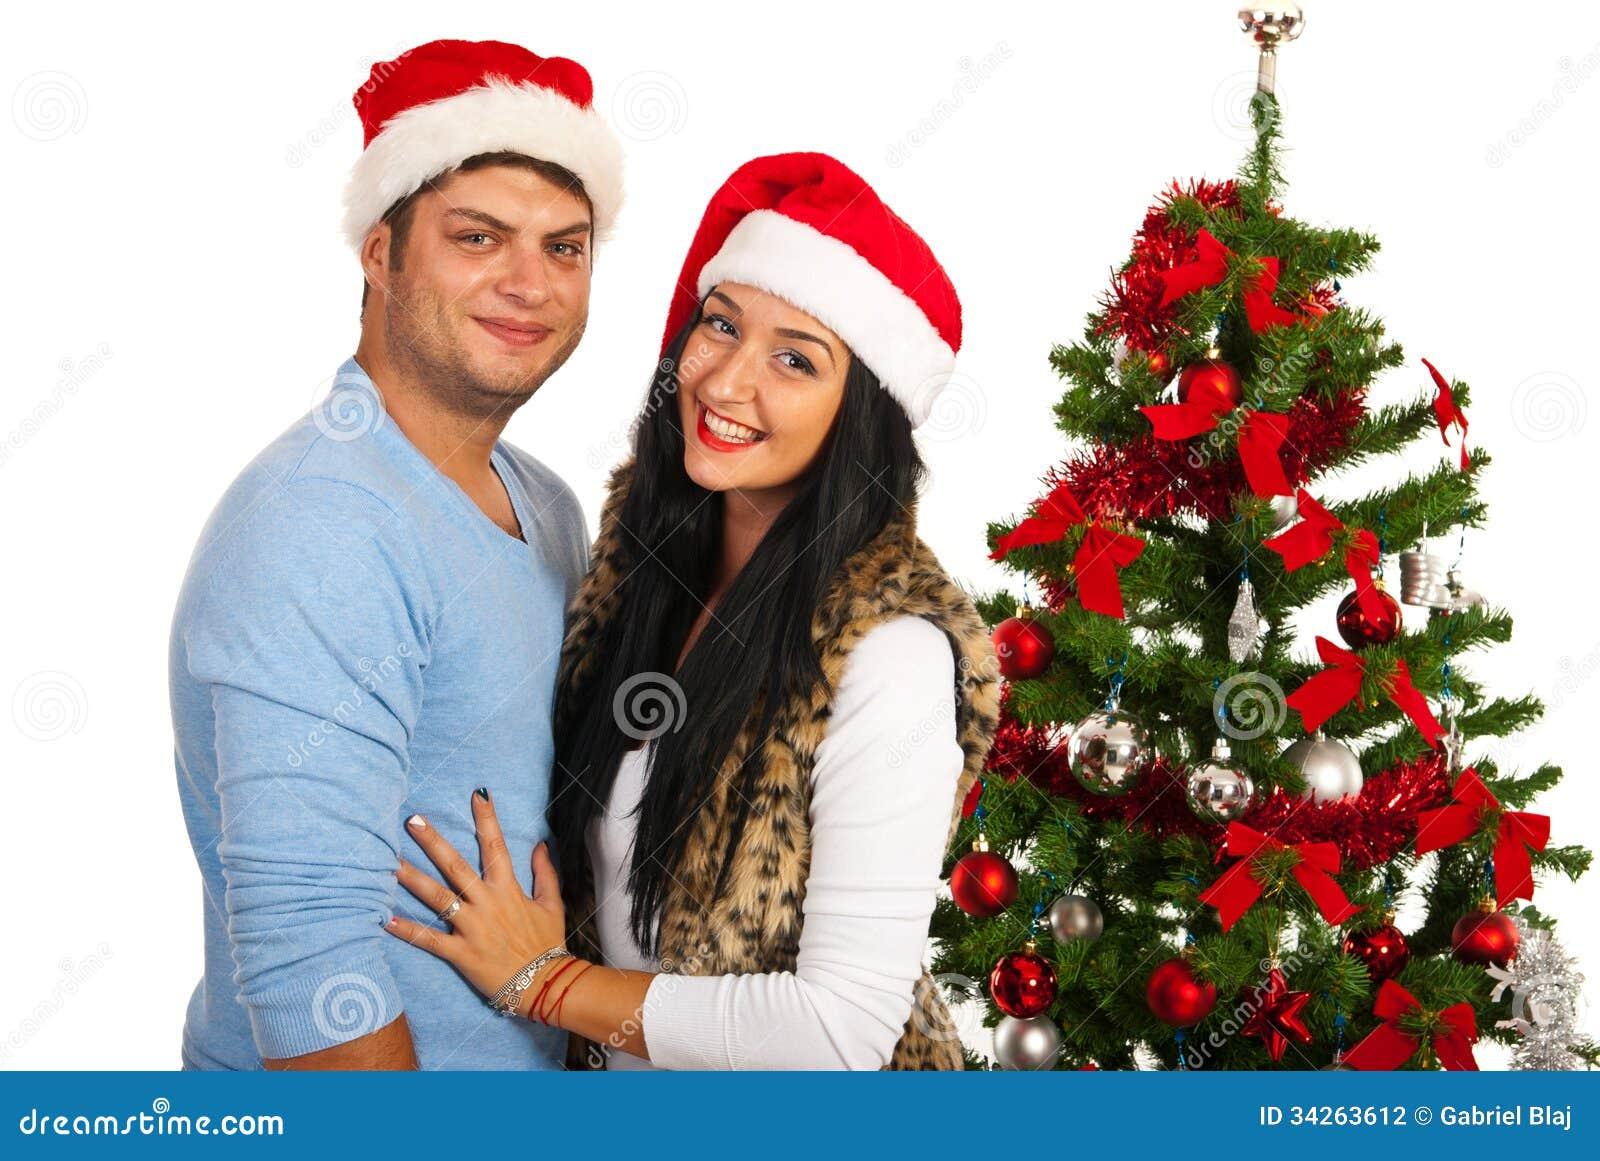 Loving Christmas Couple Stock Photography - Image: 34263612